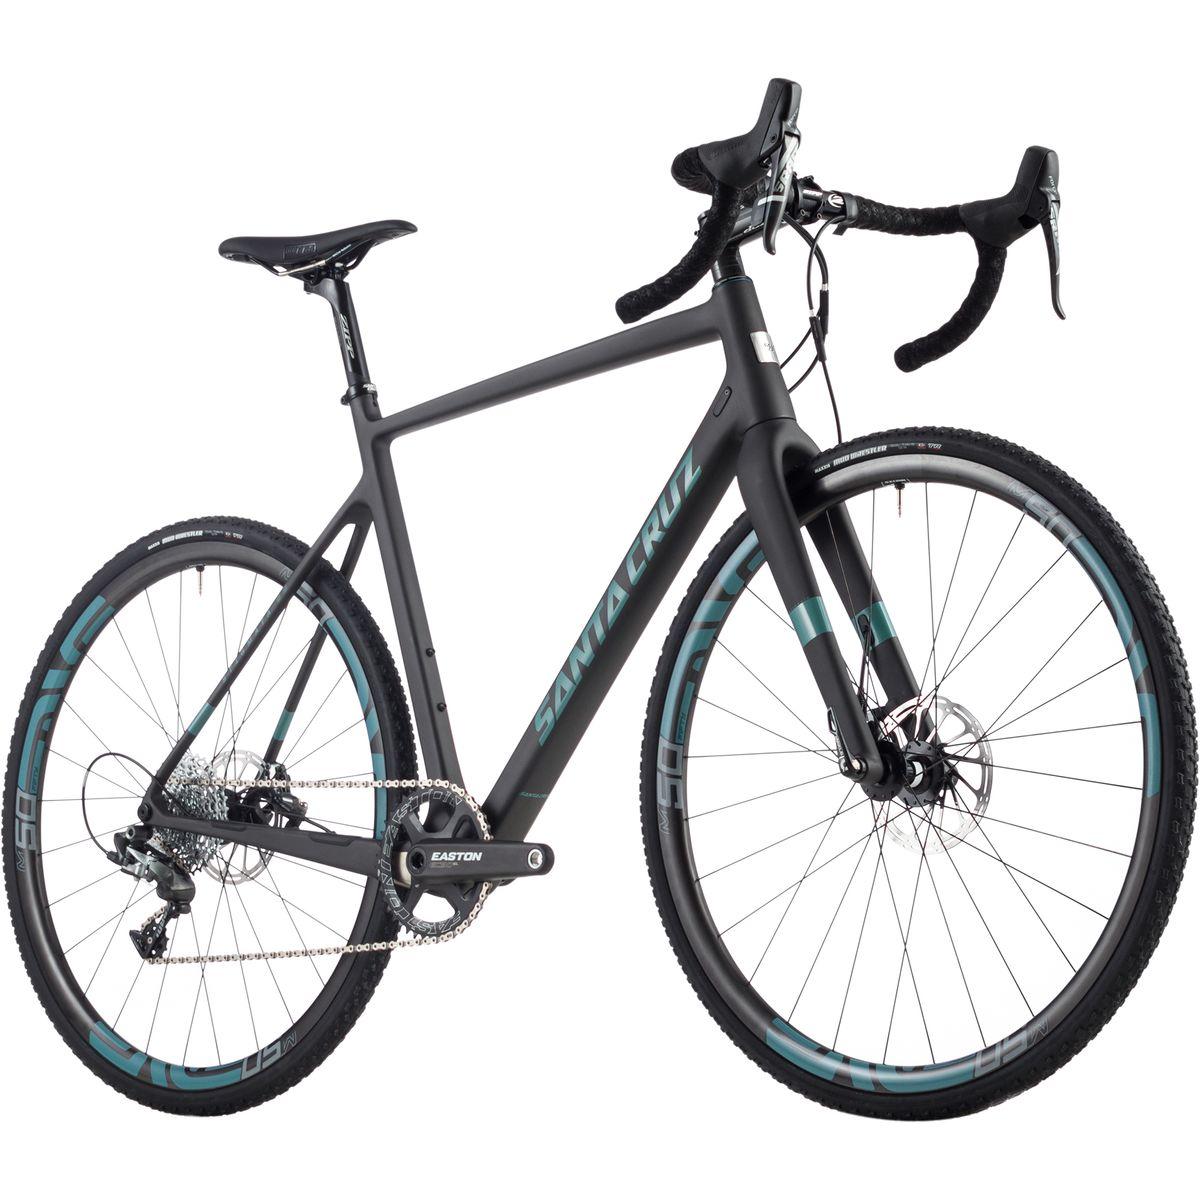 Santa Cruz Bicycles Stigmata Carbon CC Force CX1 ENVE 2017 Black Blue